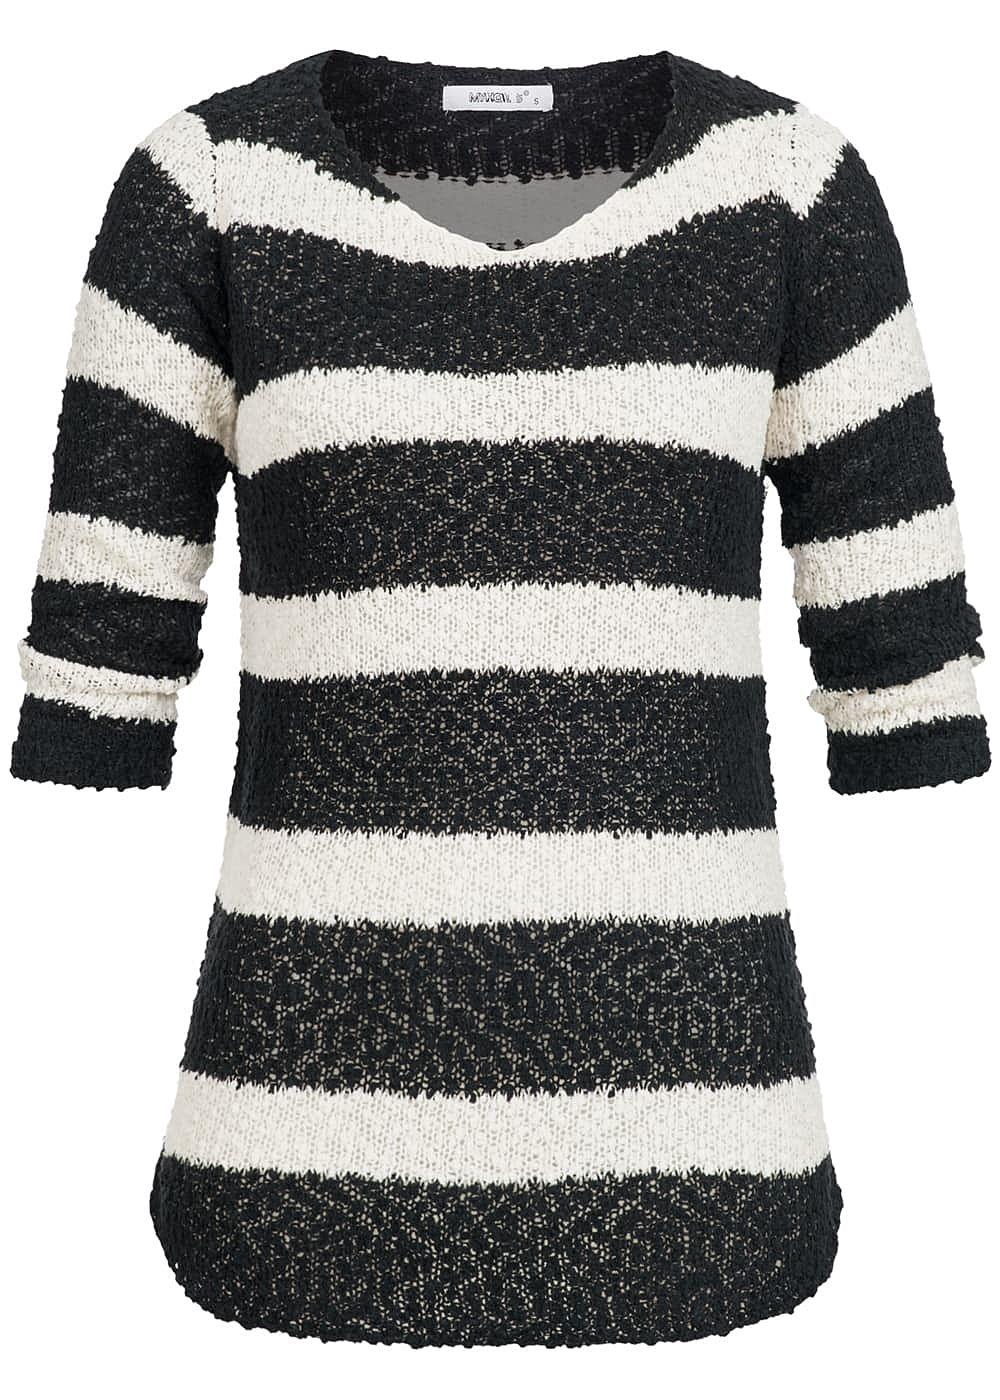 hailys damen pullover sweater grobstrick streifen muster. Black Bedroom Furniture Sets. Home Design Ideas